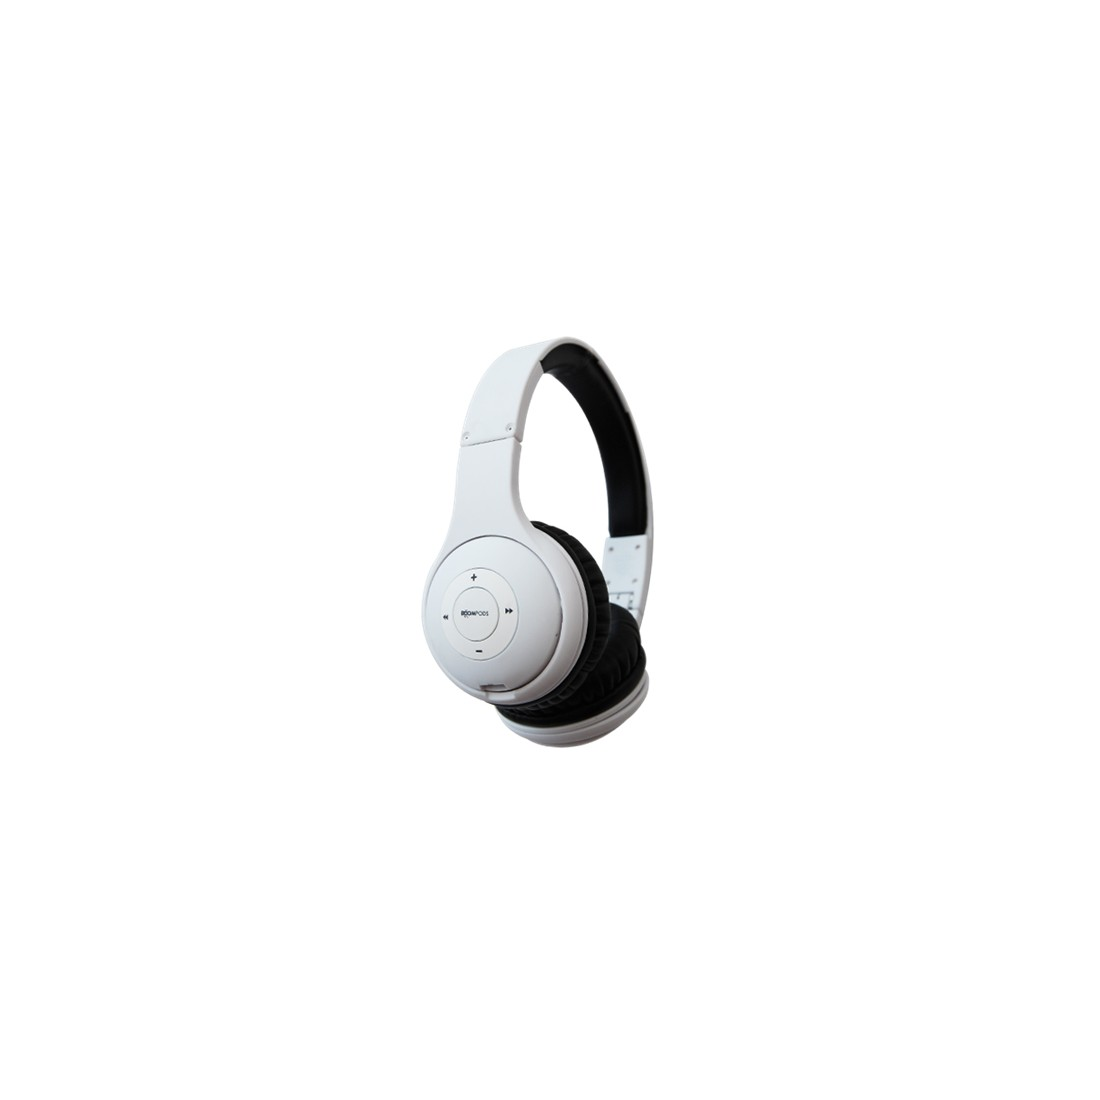 Auricular Diadema - Boompods WLHPWHT Headpods, Bluetooth, Blanco